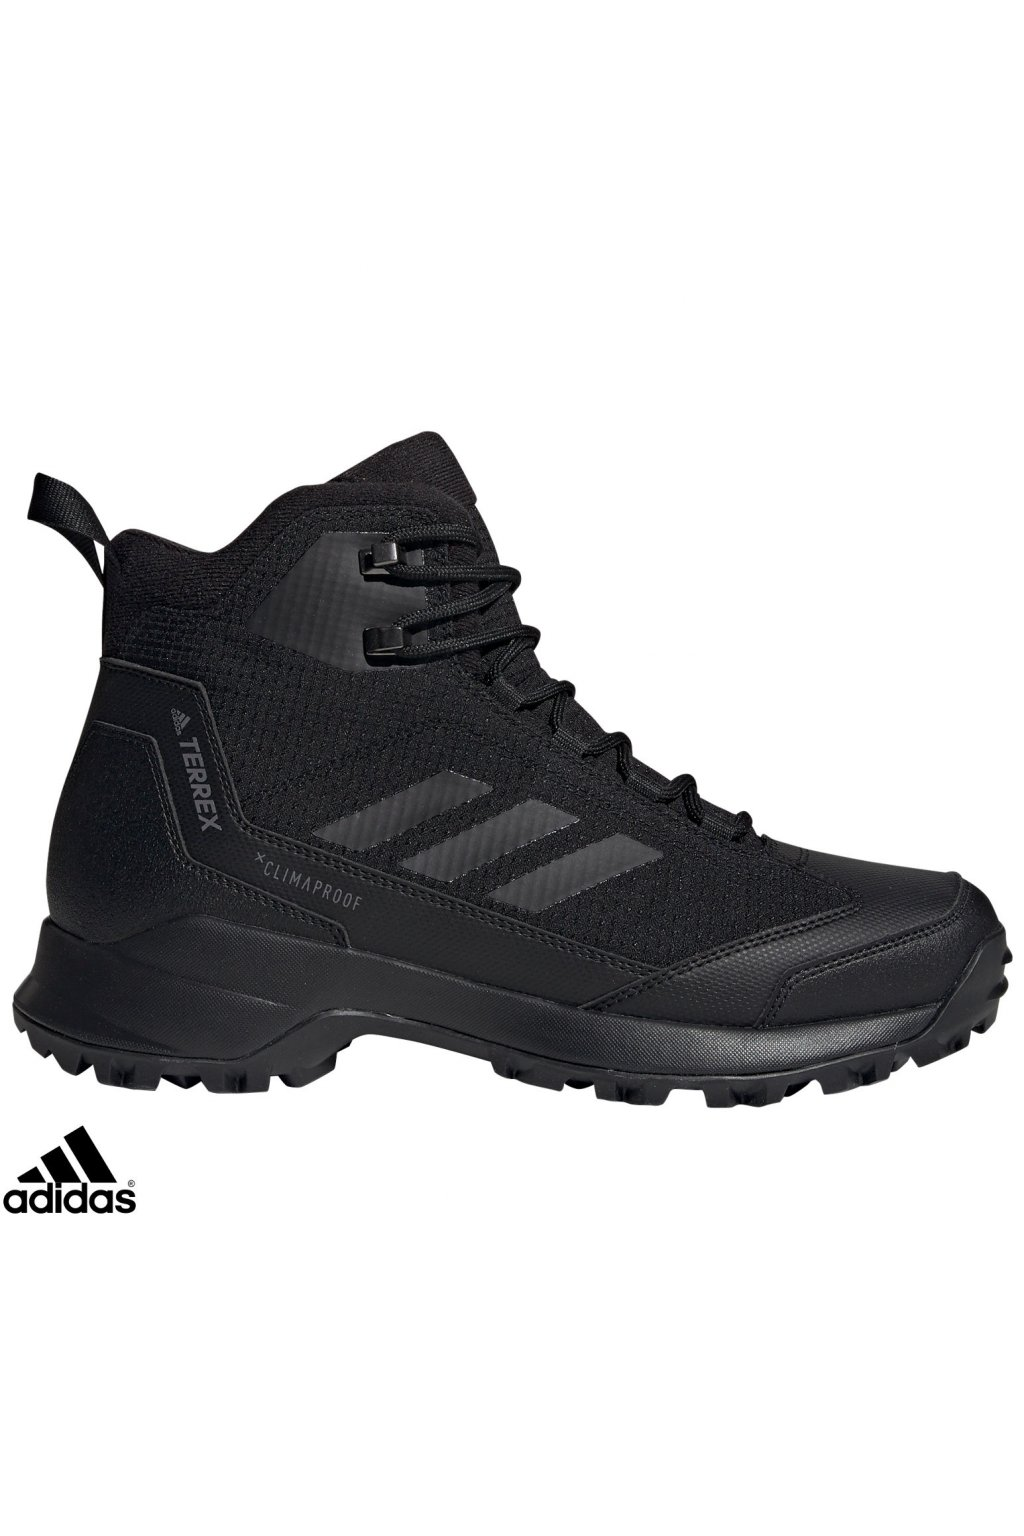 ac7841 turisticke topanky adidas terrex heron mid